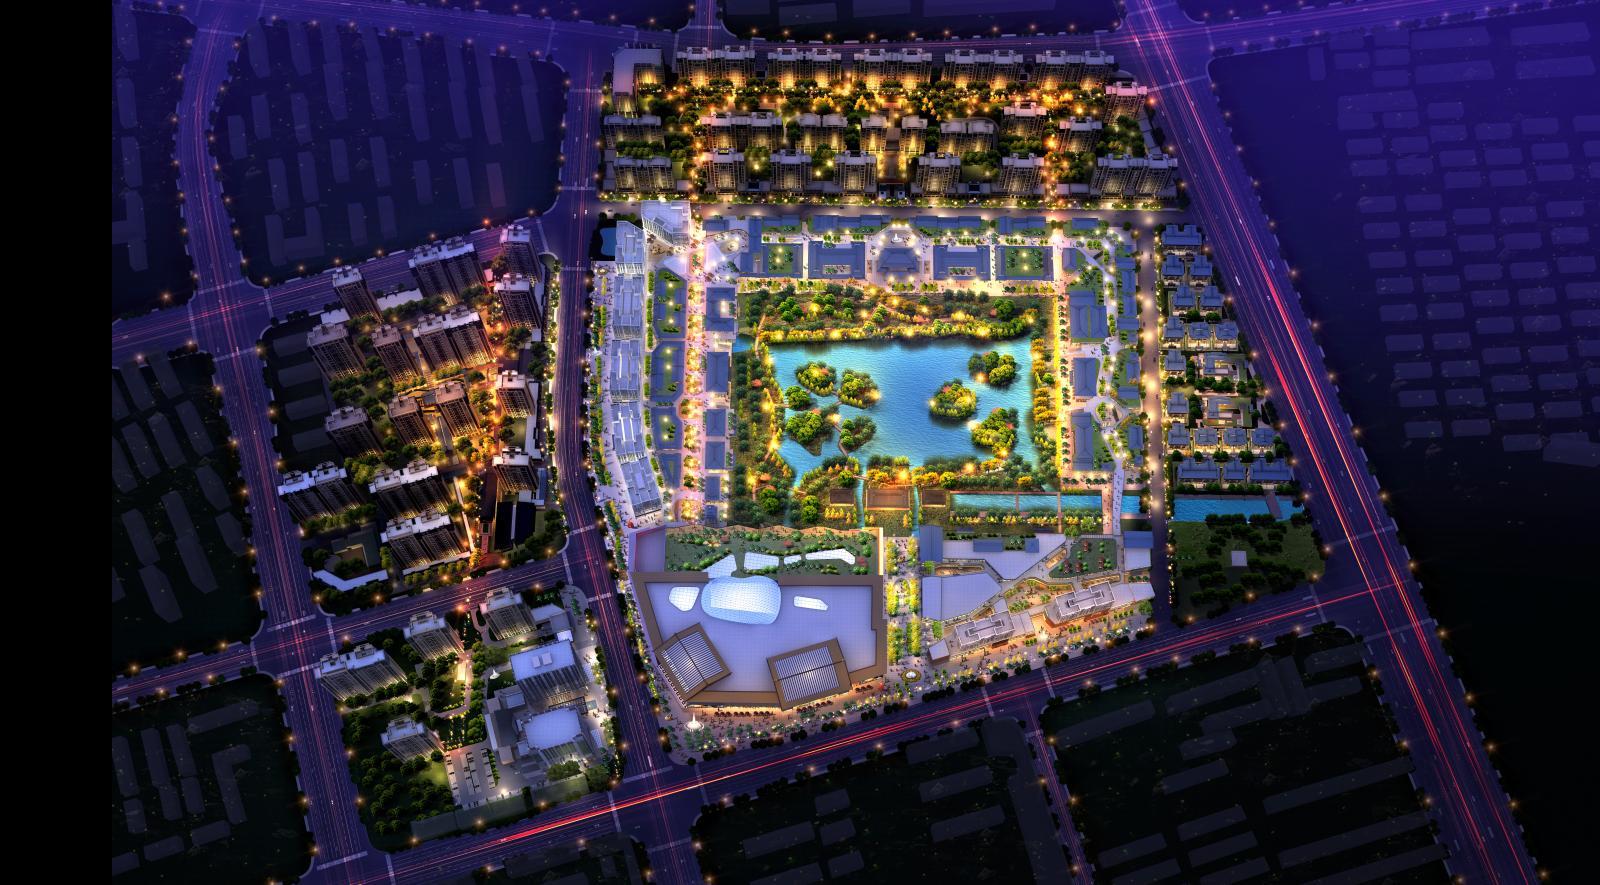 Dennis Plaza in Luoyang